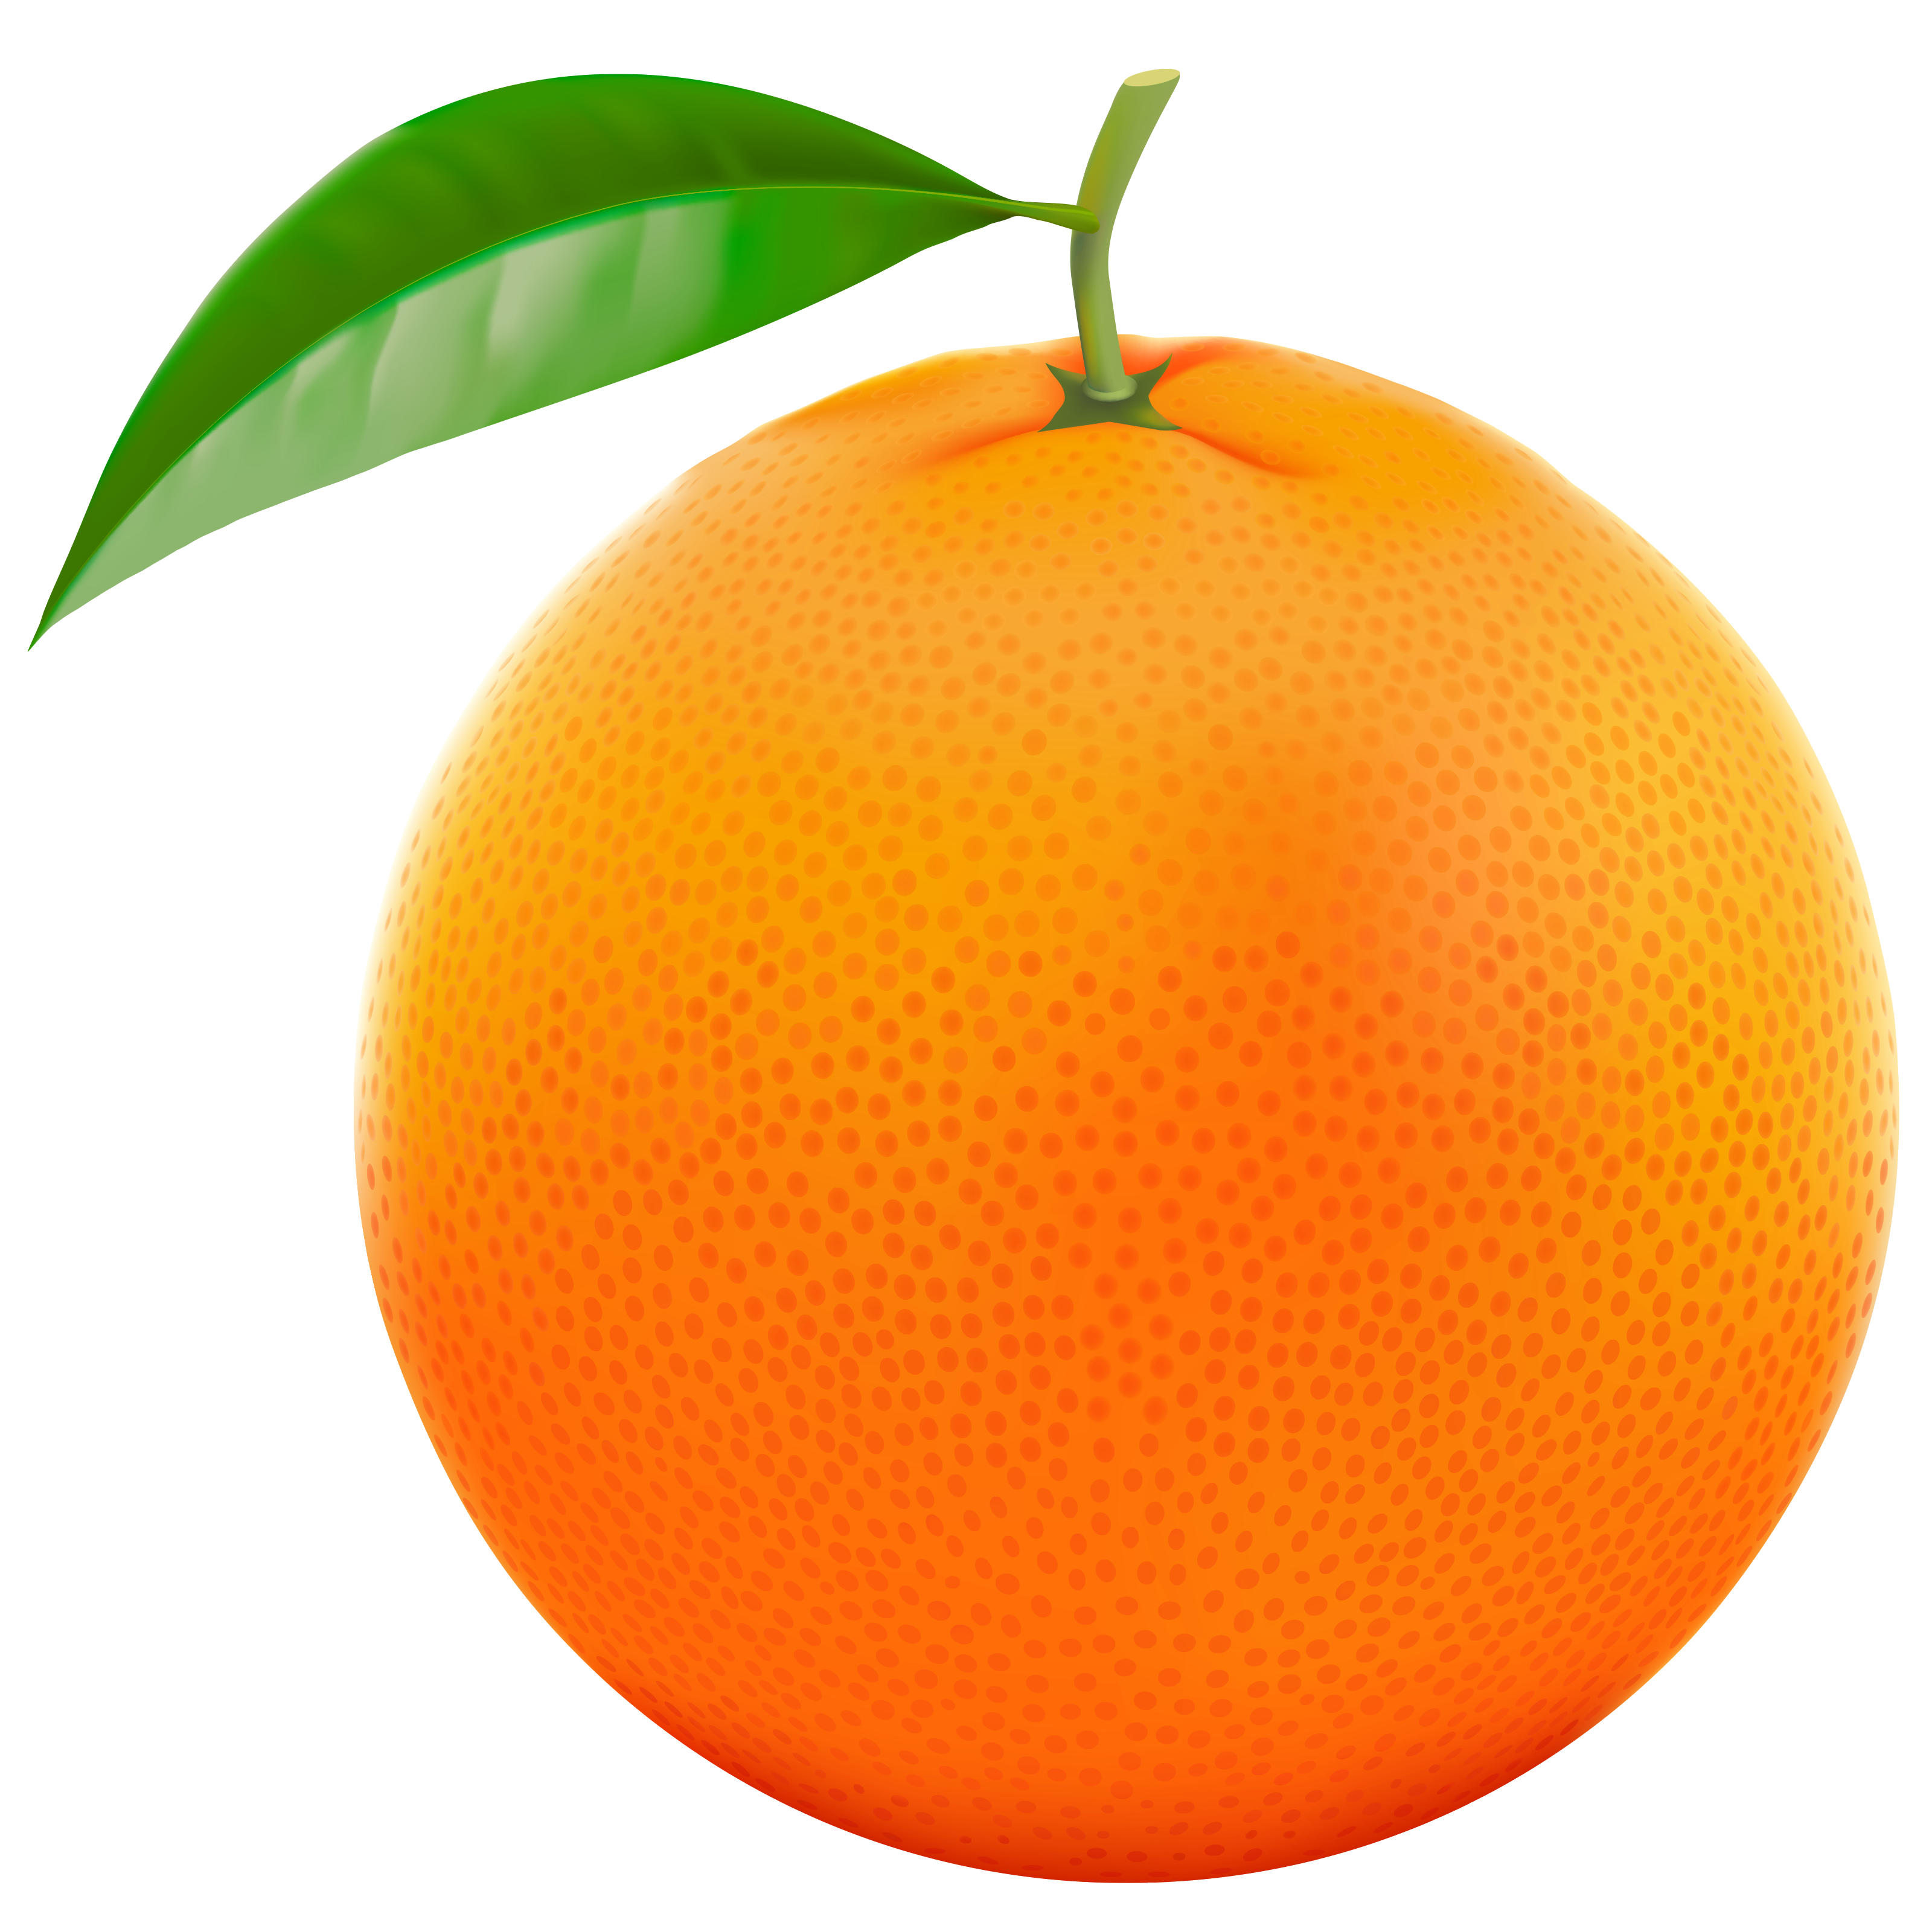 Orange clipart #1, Download drawings